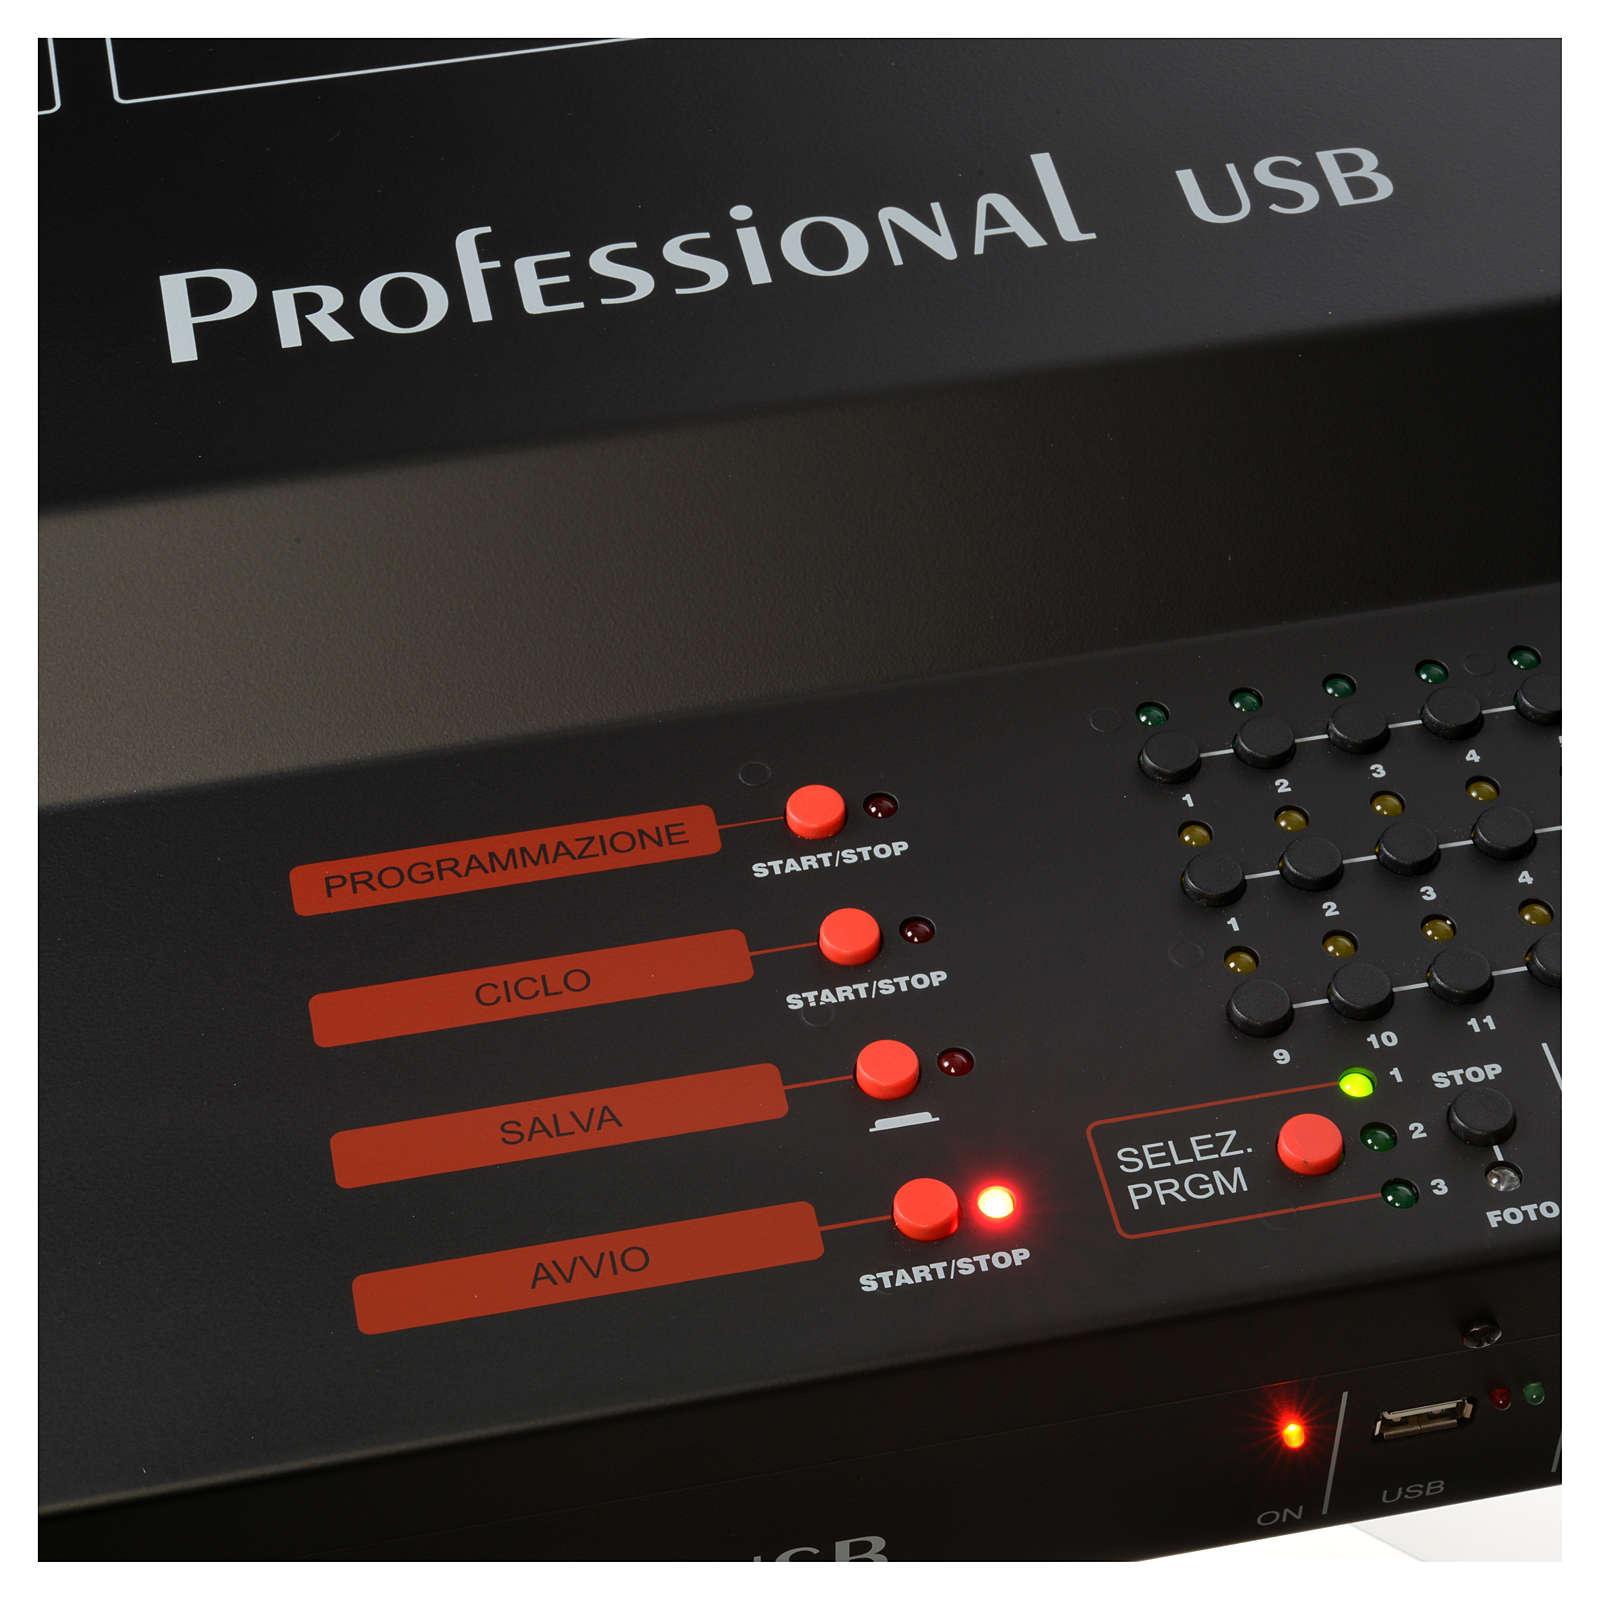 Professional USB 4